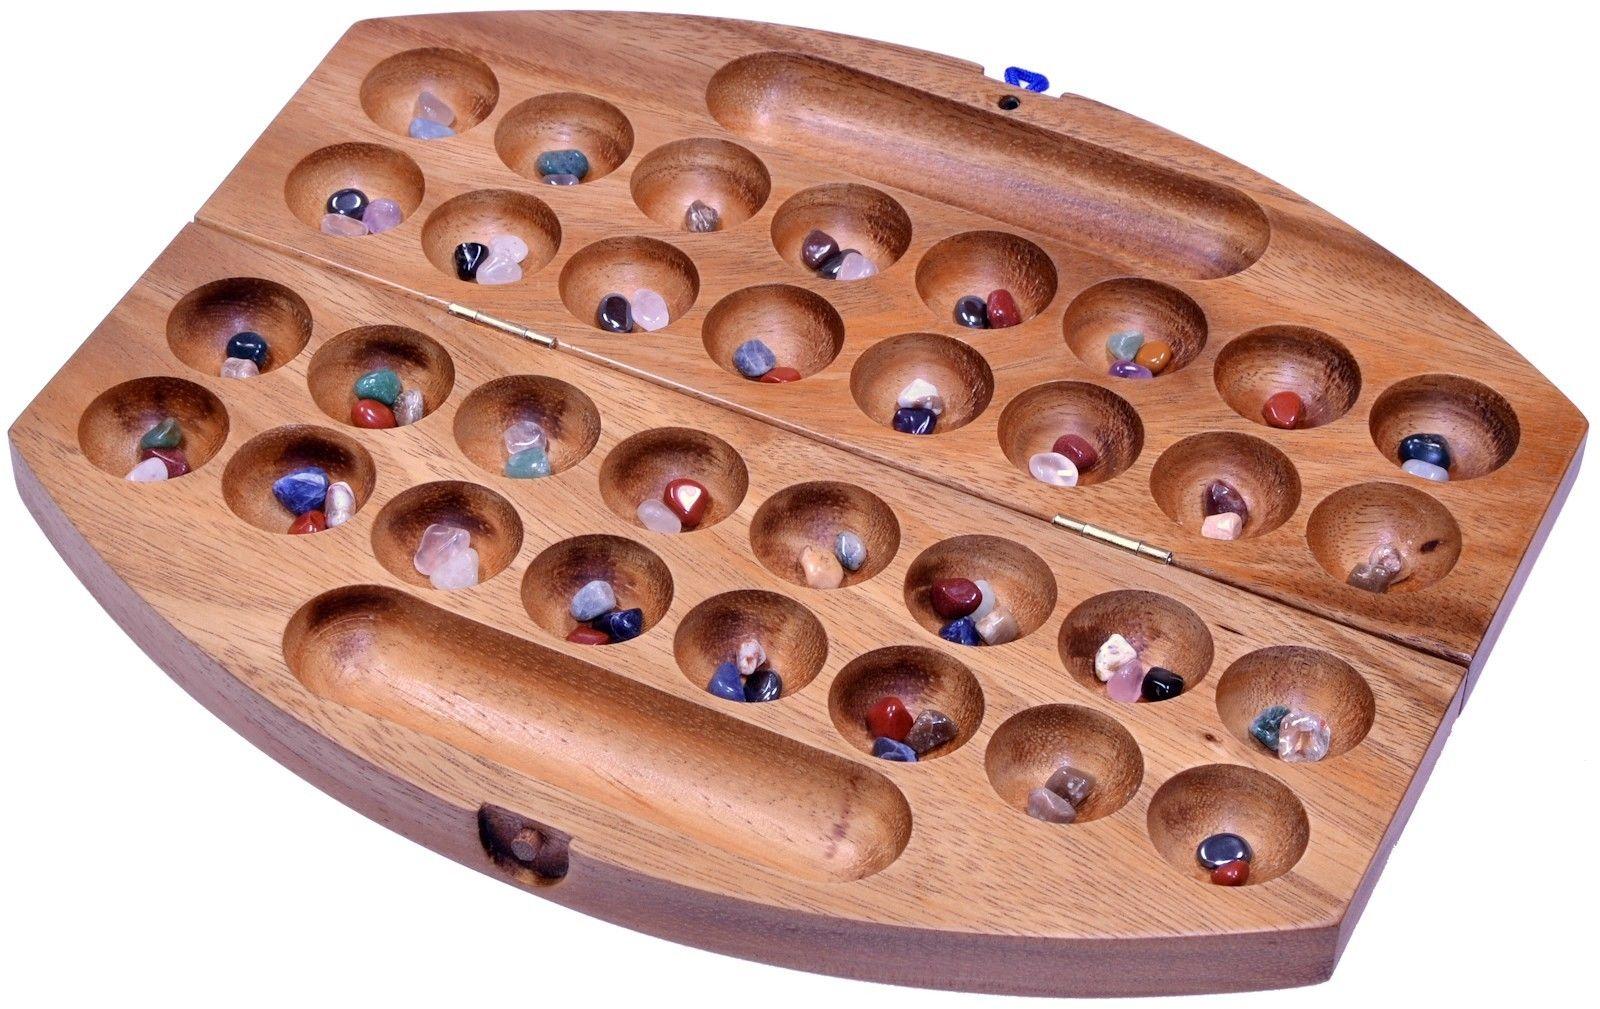 Bao Hus Kalaha Steinchenspiel Edelsteine Spiel oval Samena Holz Gr. L - 2. Wahl